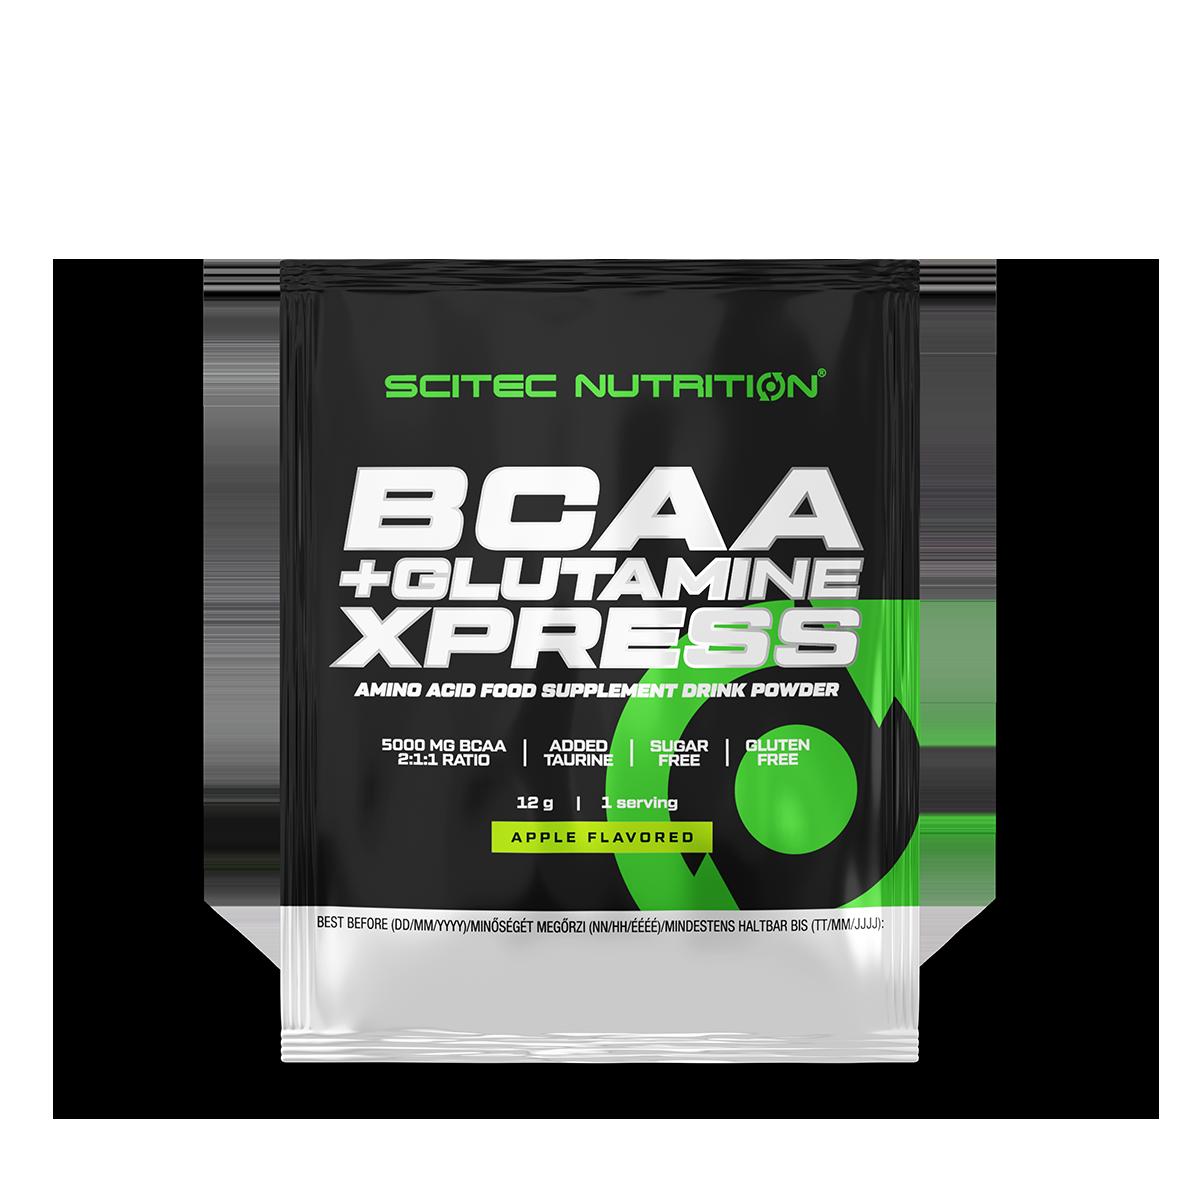 Scitec Nutrition BCAA + Glutamine Xpress 12 gr.